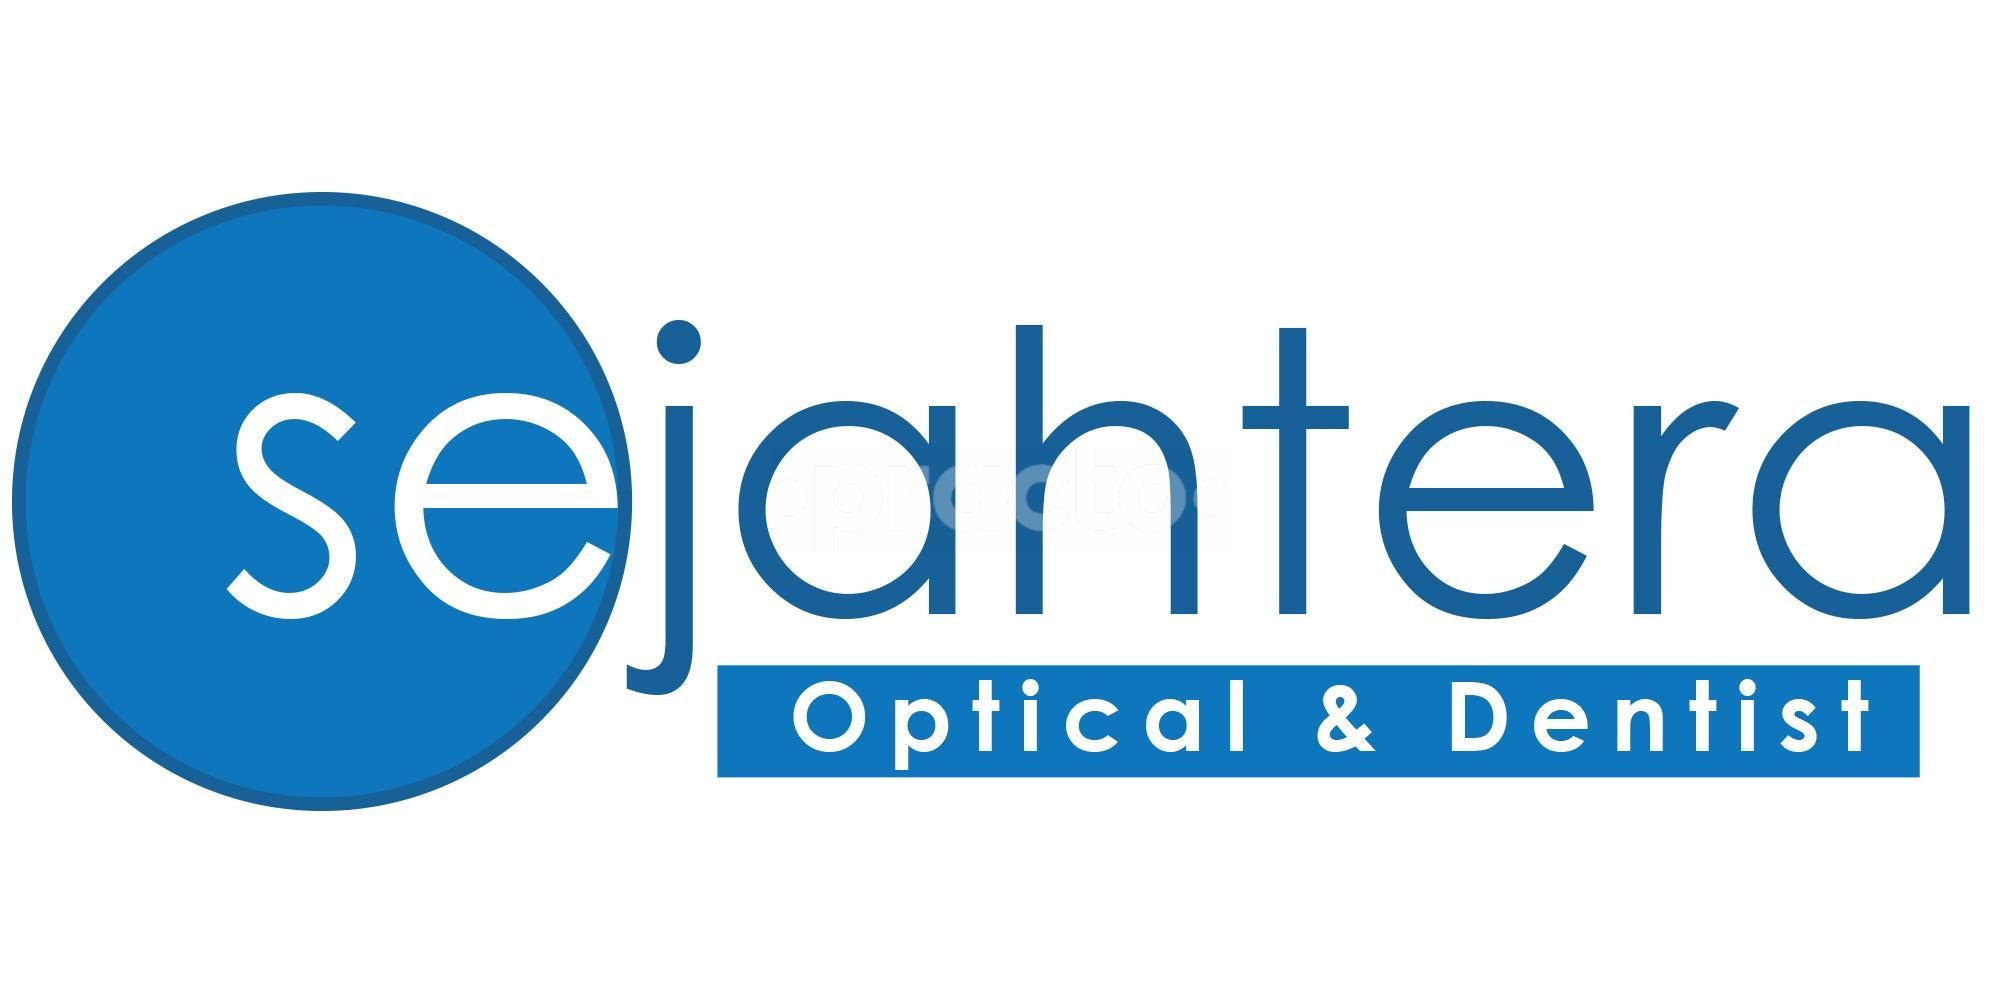 Sejahtera Optical and Dentist